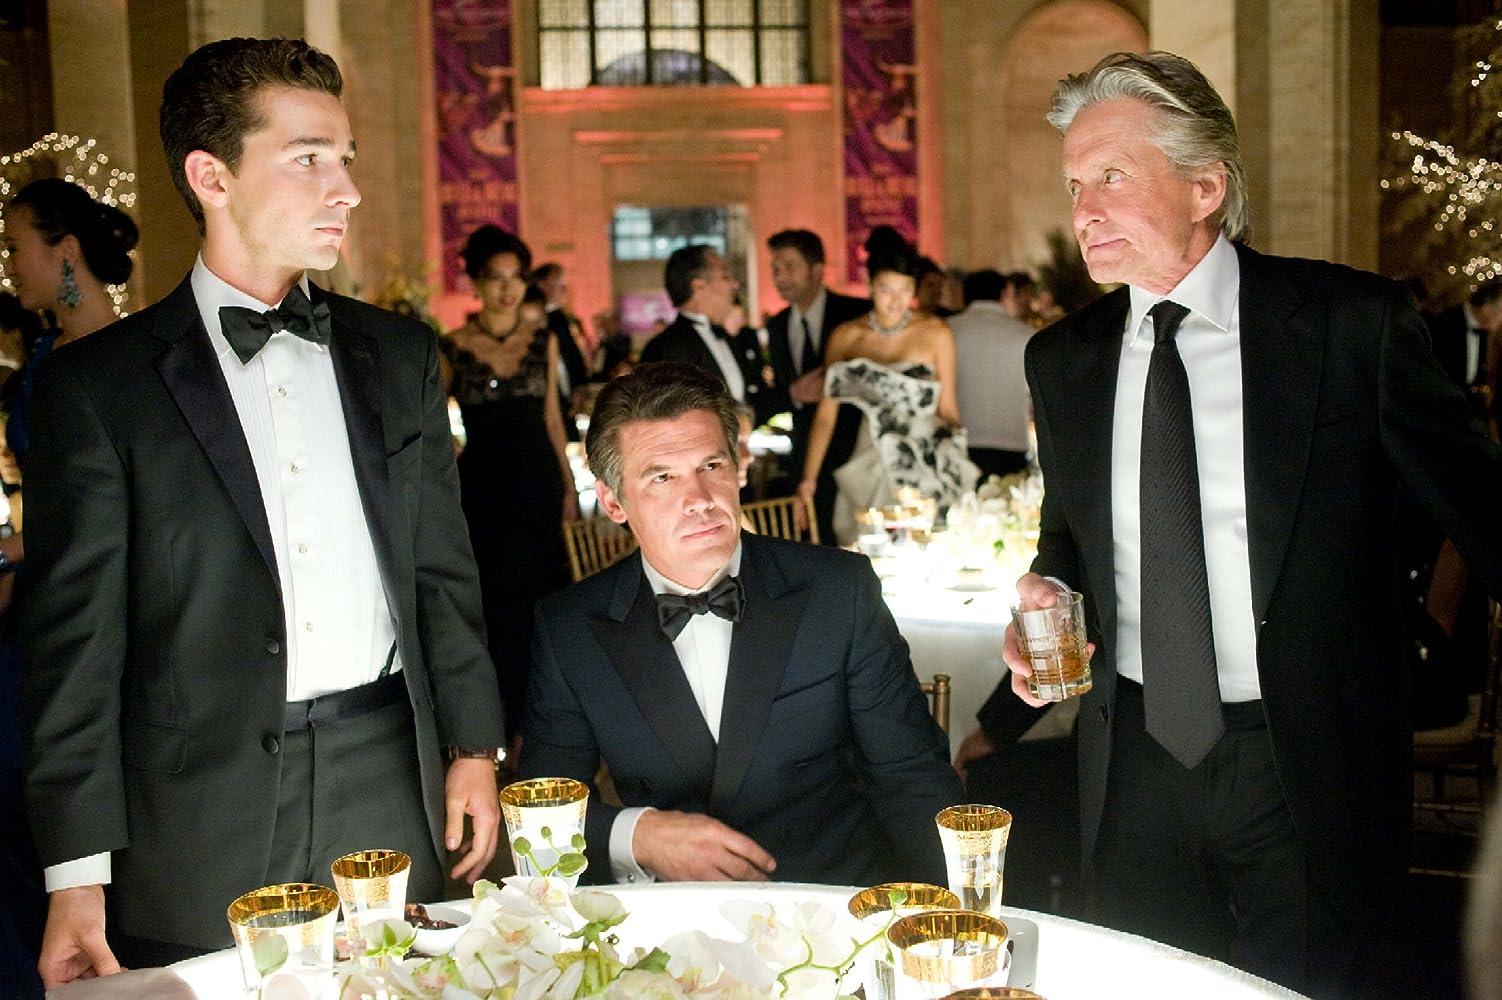 Michael Douglas, Josh Brolin, and Shia LaBeouf in Wall Street: Money Never Sleeps (2010)